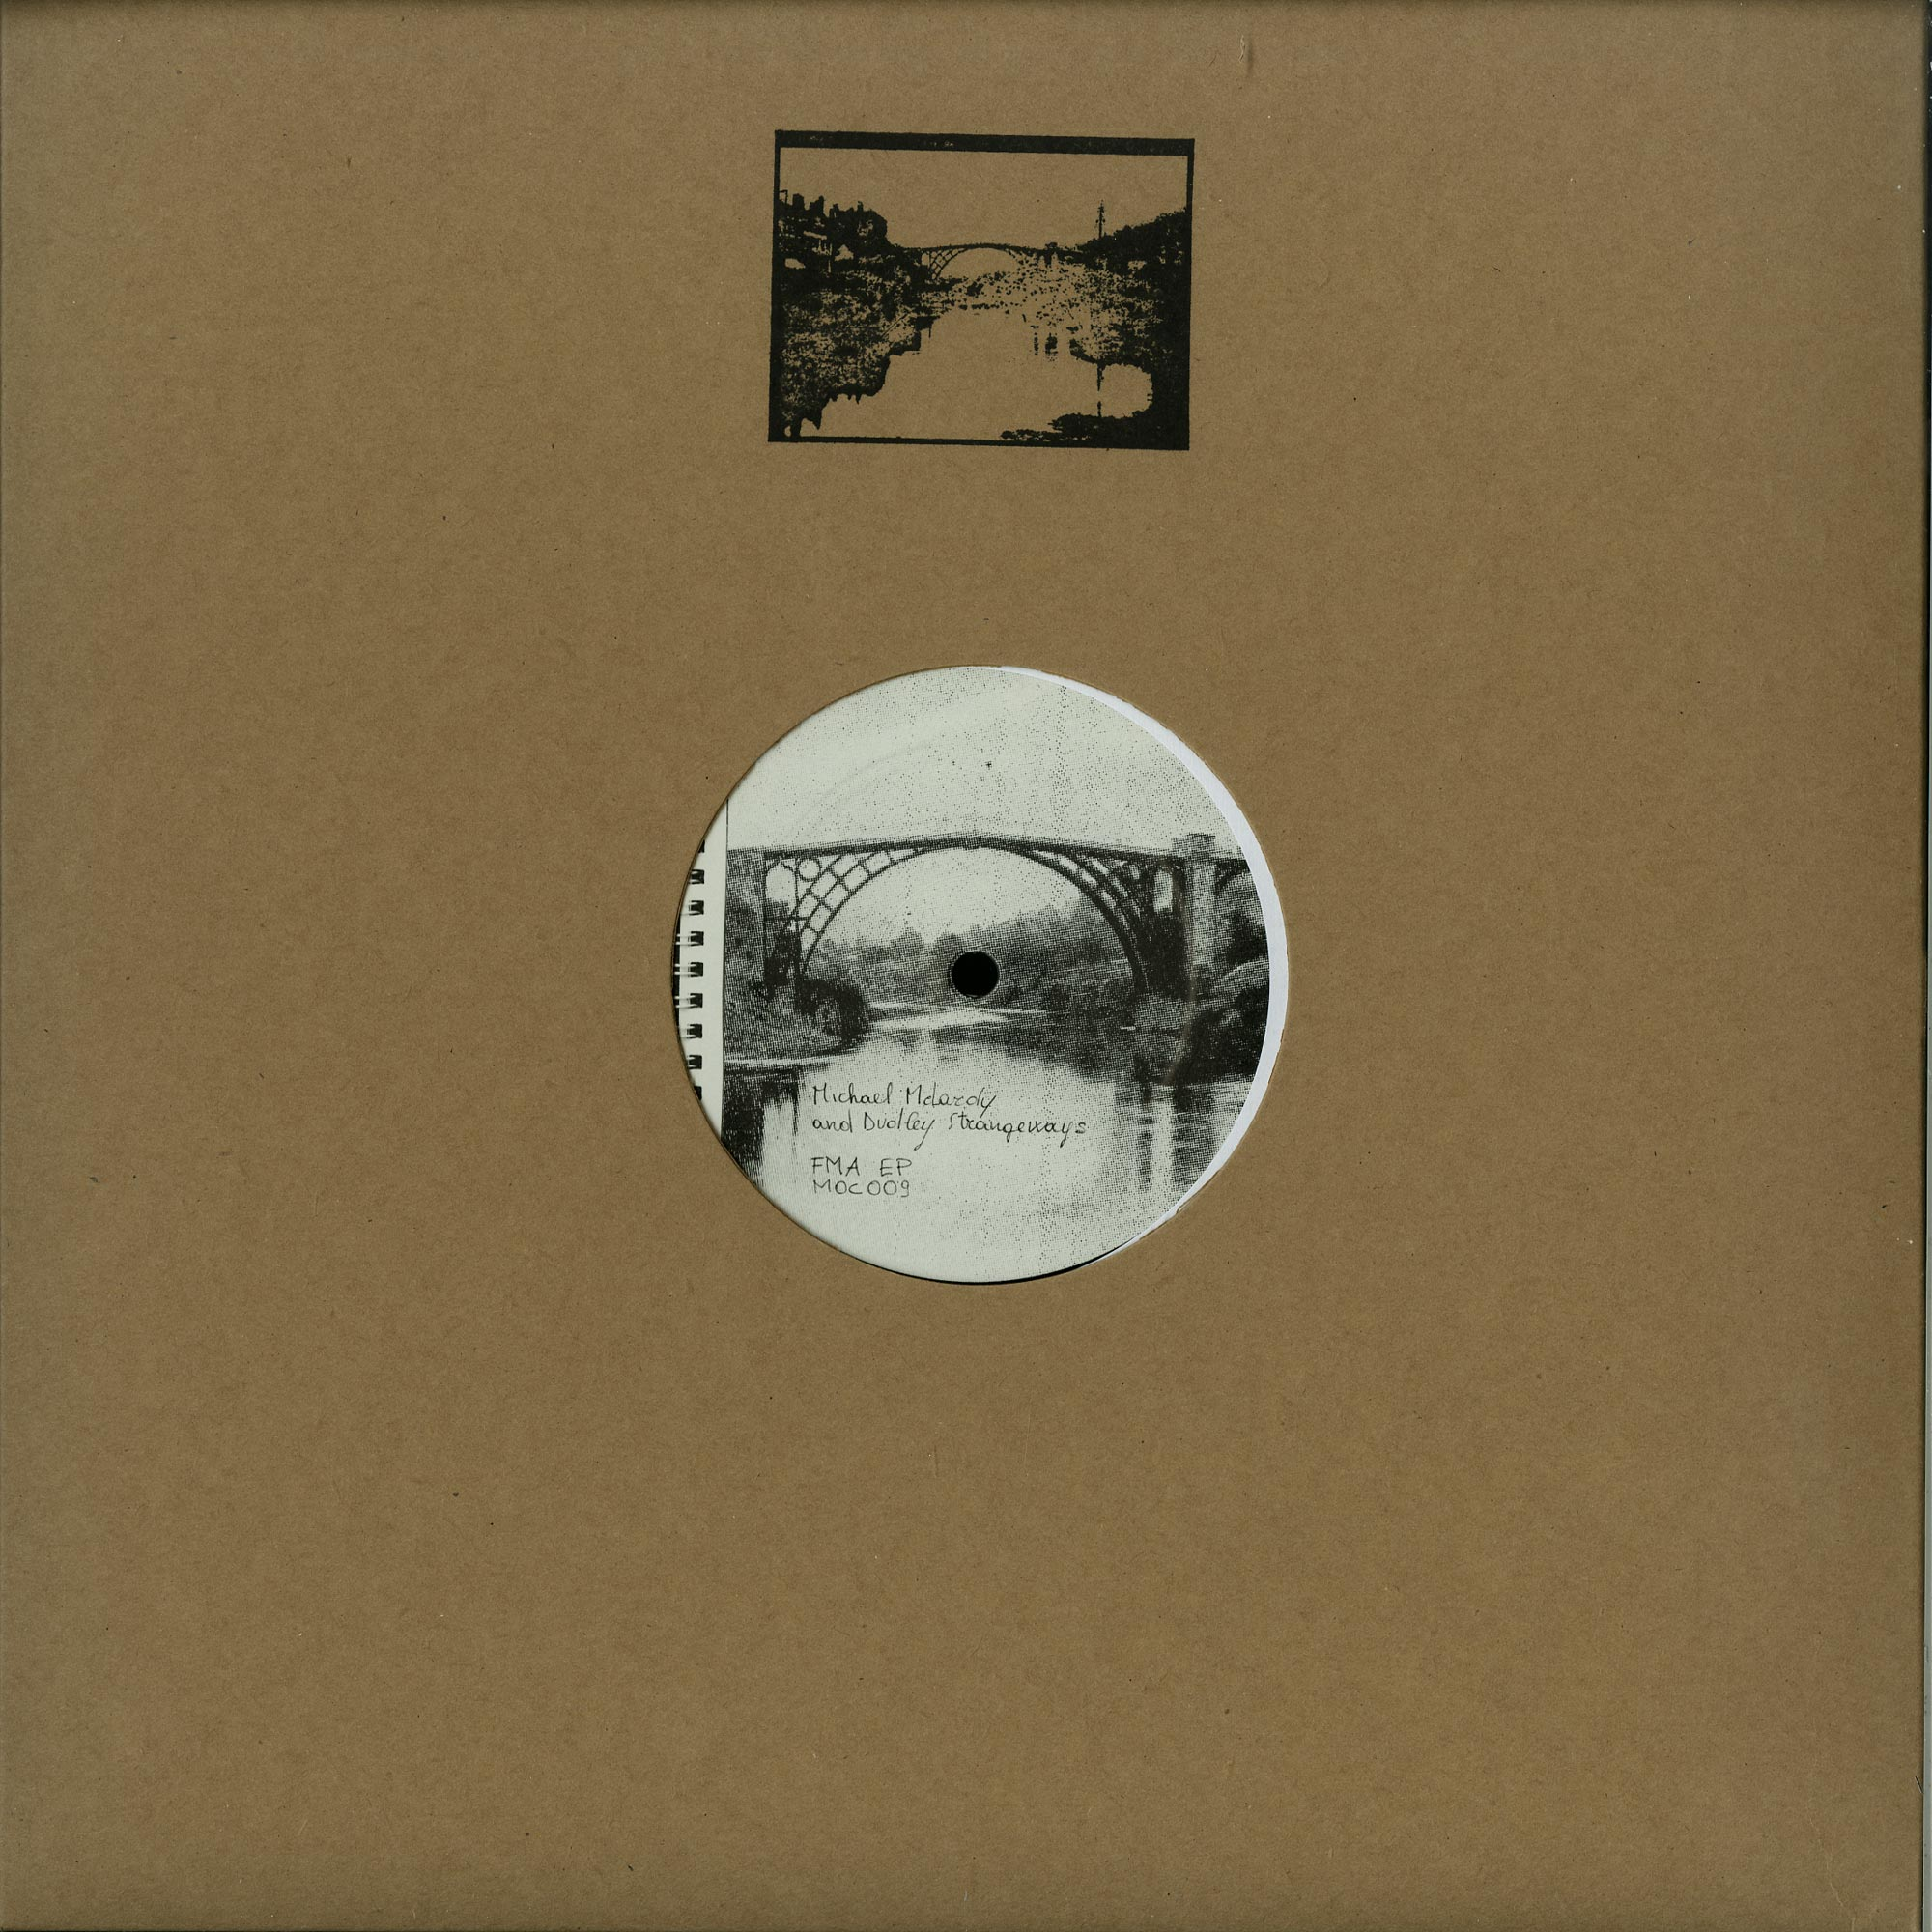 Michael McLardy. Dudley Strangeways - FMA EP